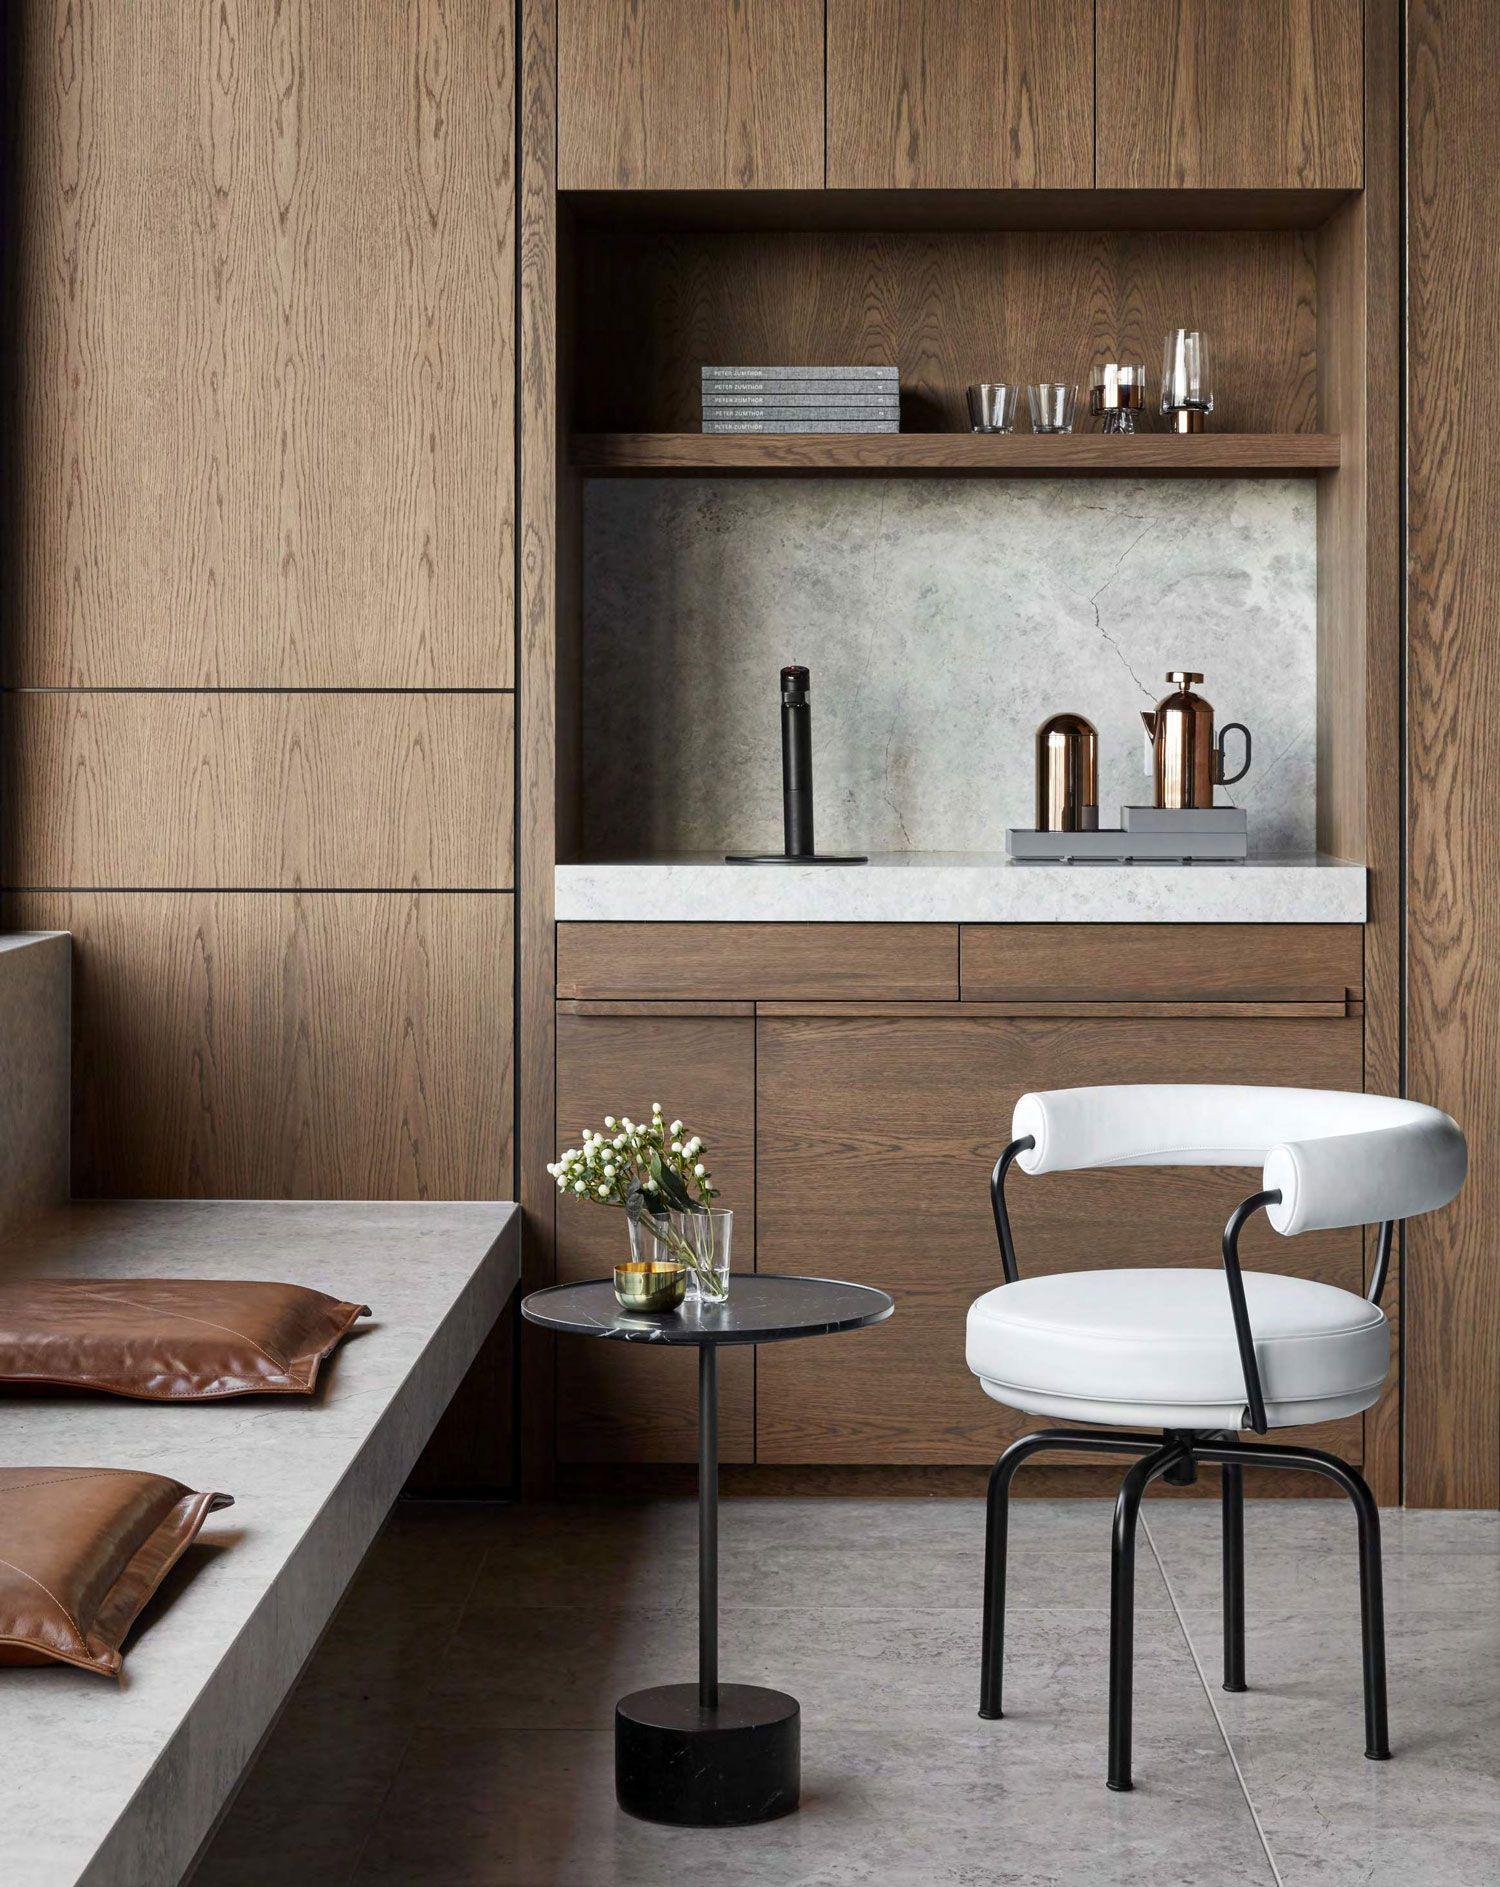 Fantástico Muebles De Almacenamiento De Melbourne Motivo - Muebles ...